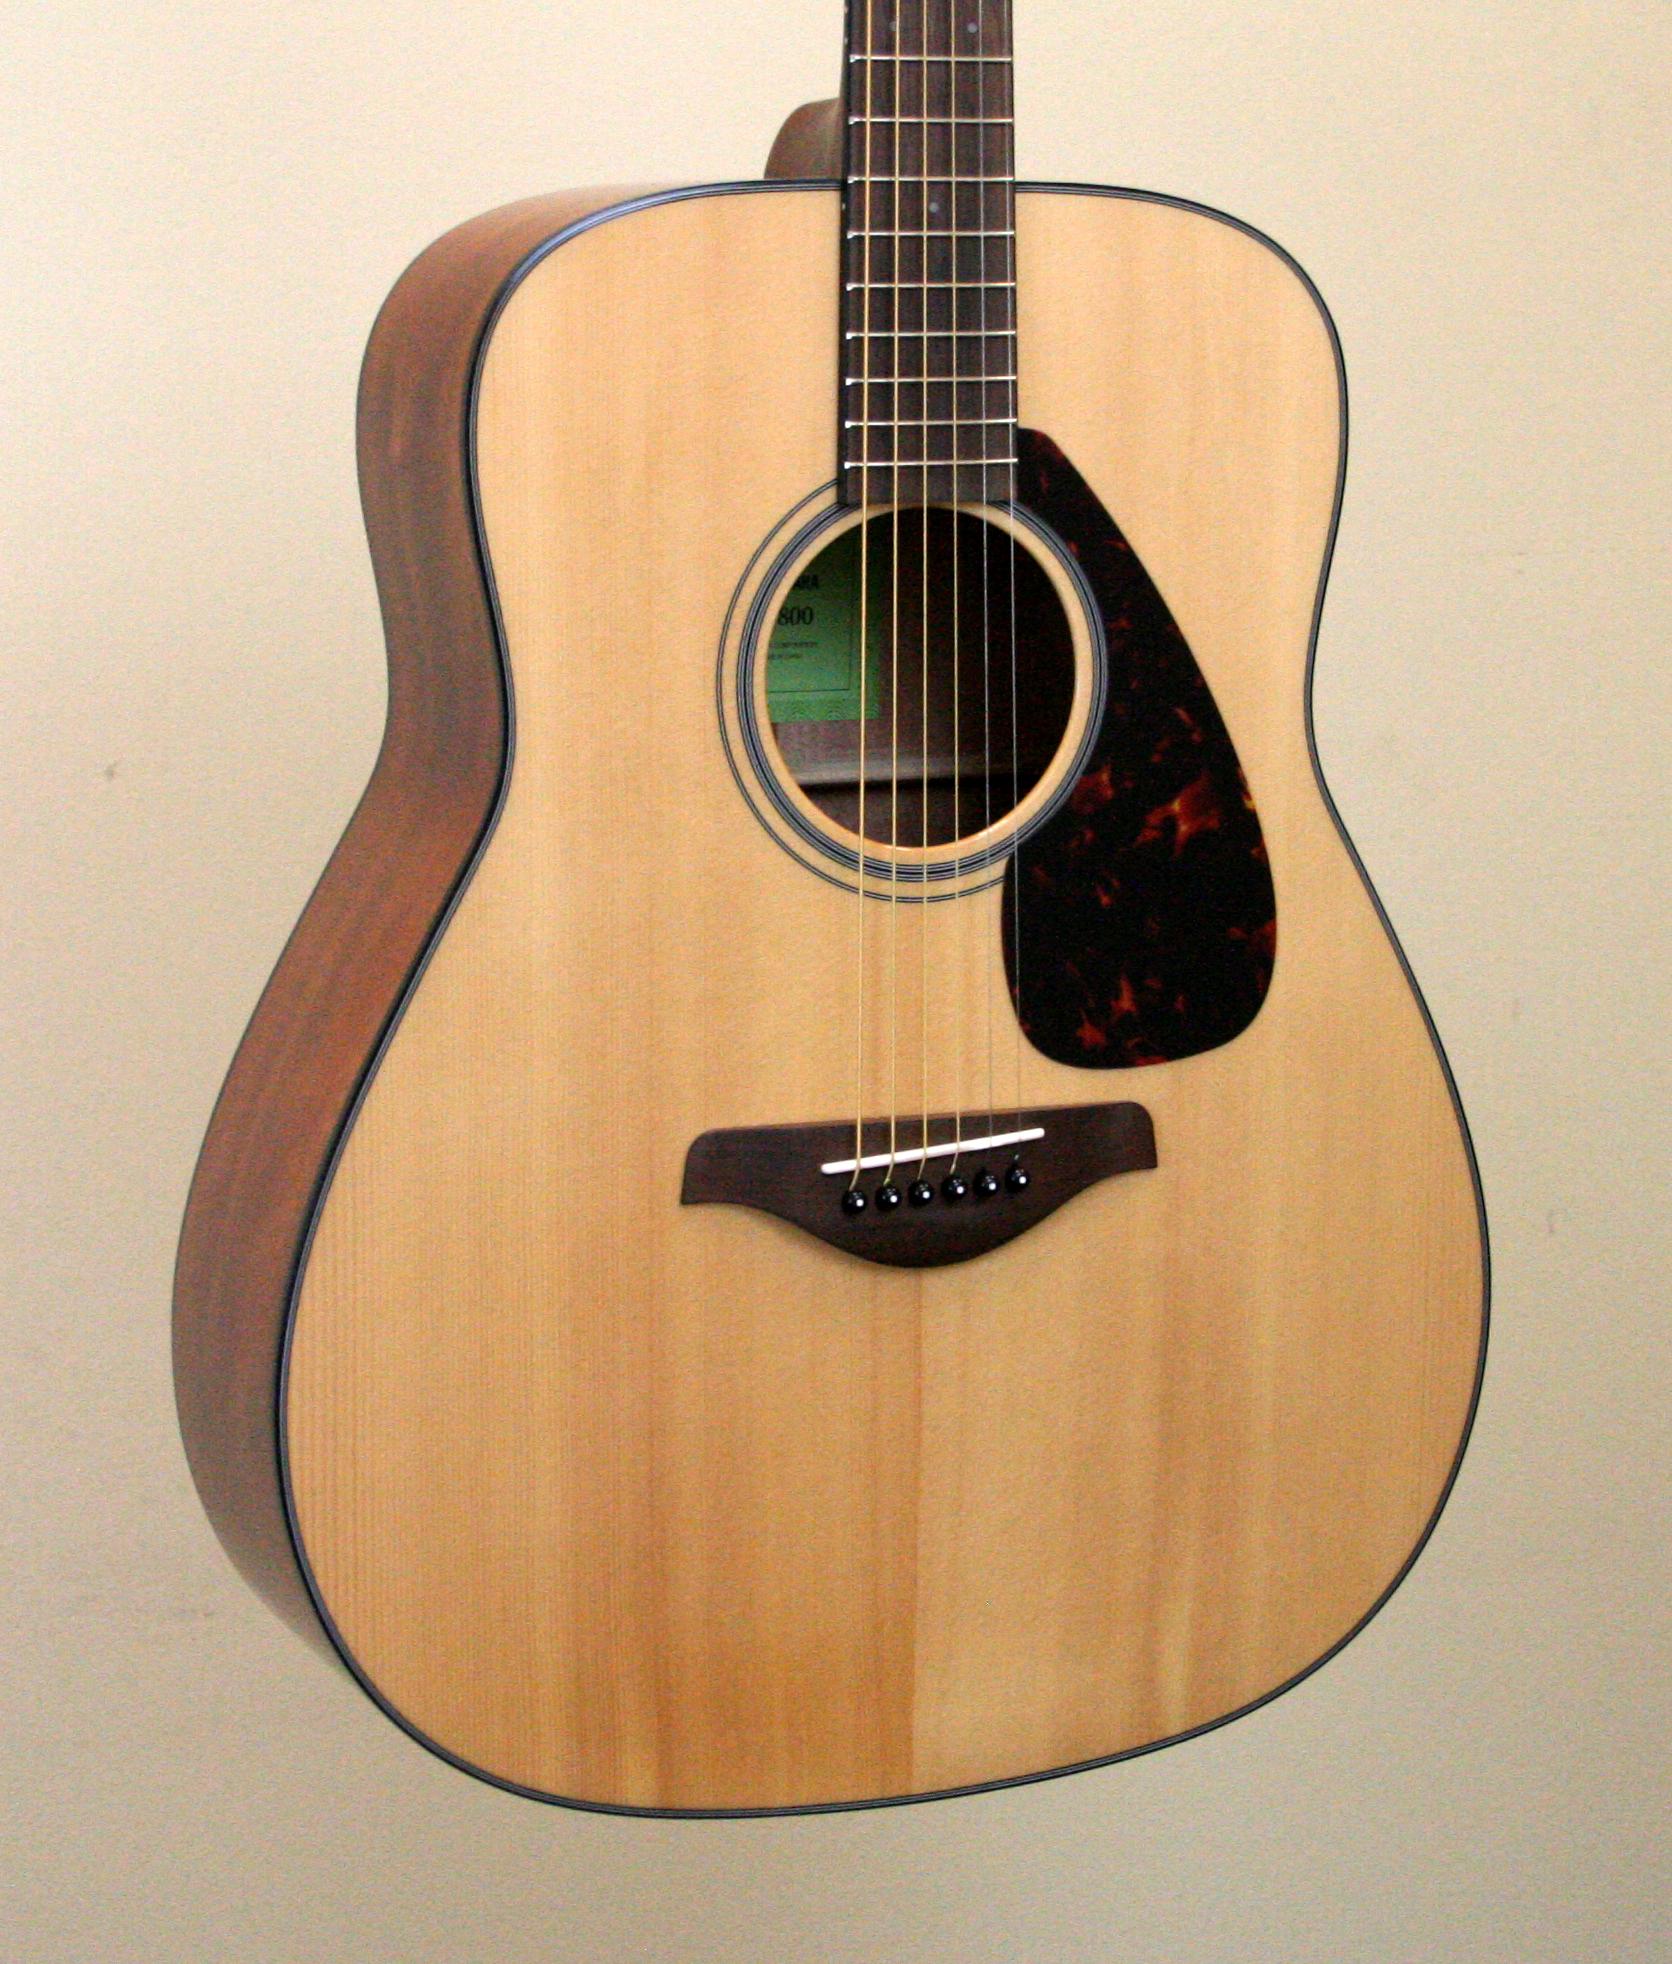 Yamaha FG800 Dreadnought Acoustic Guitar